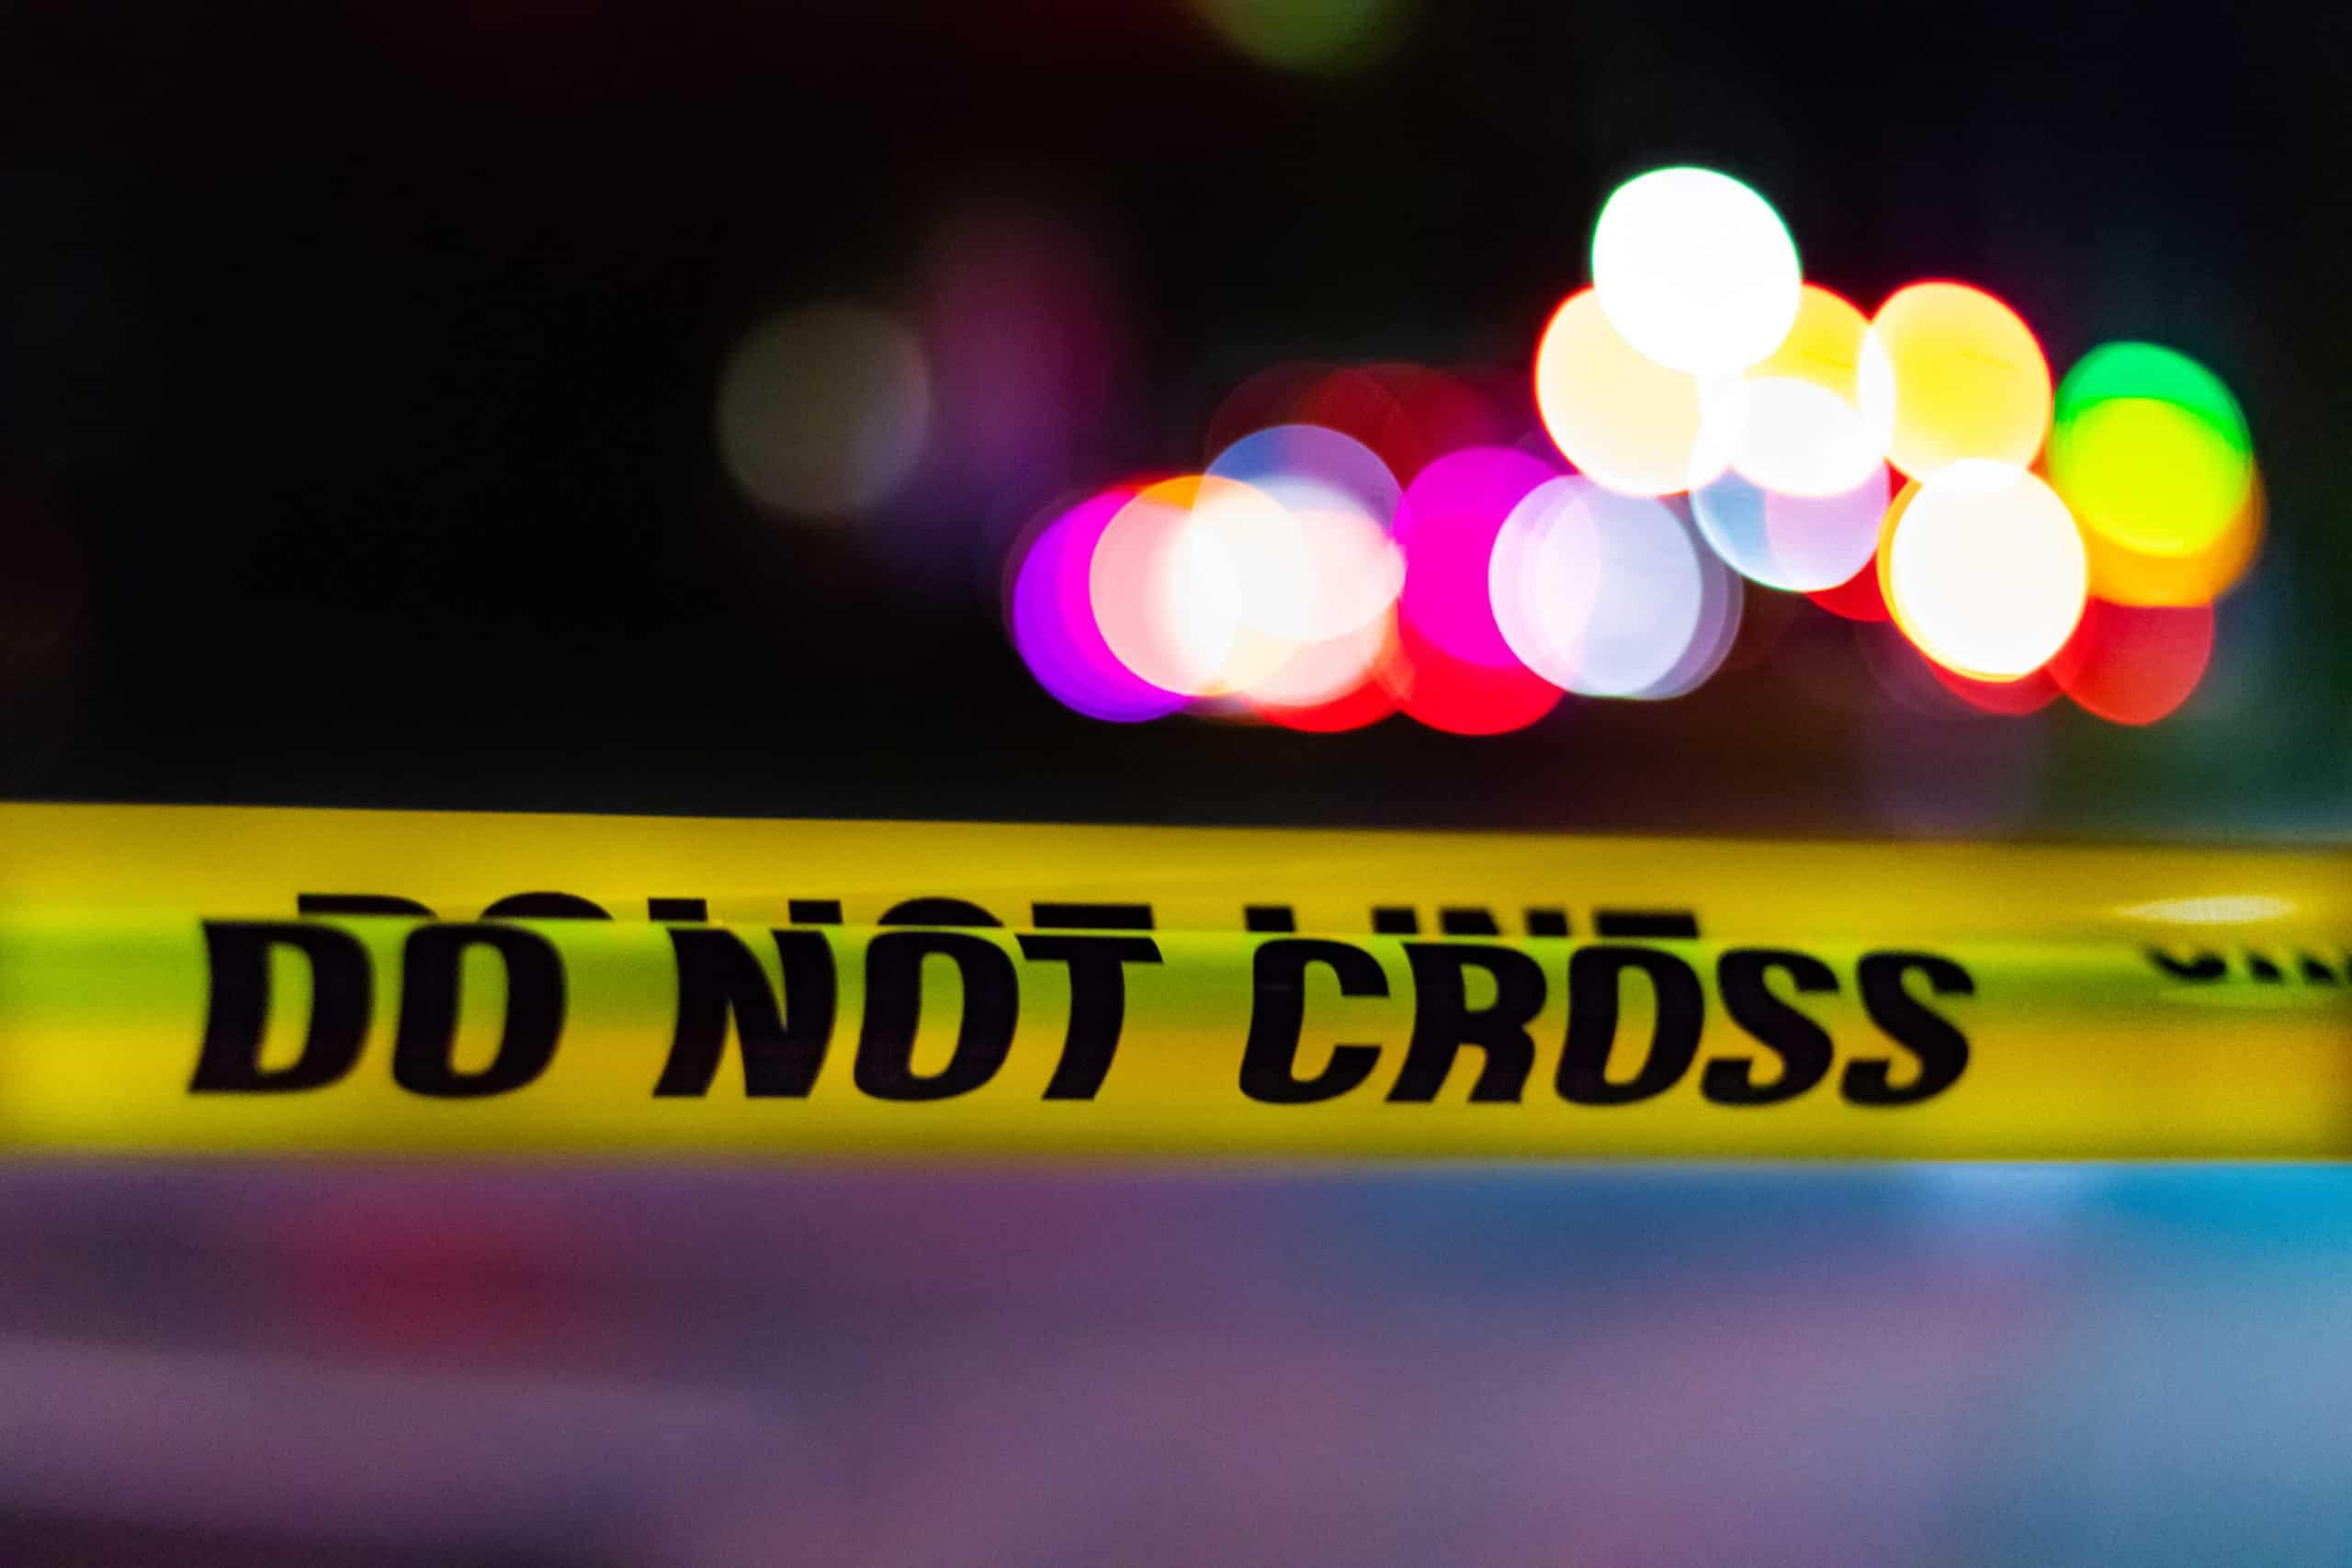 Male Passenger Dies in Currier Road Two-Vehicle Crash [Industry, CA]